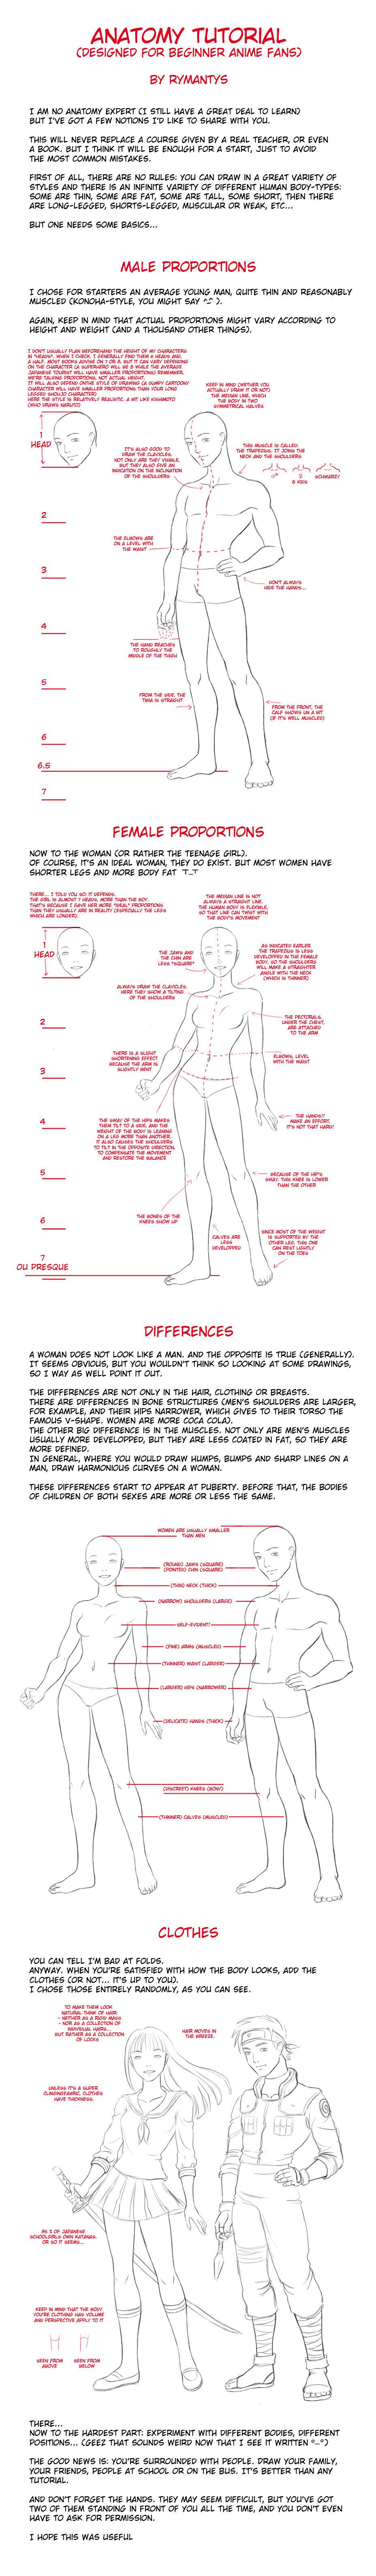 Anatomy Tutorial For Beginners By Rymantys On Deviantart